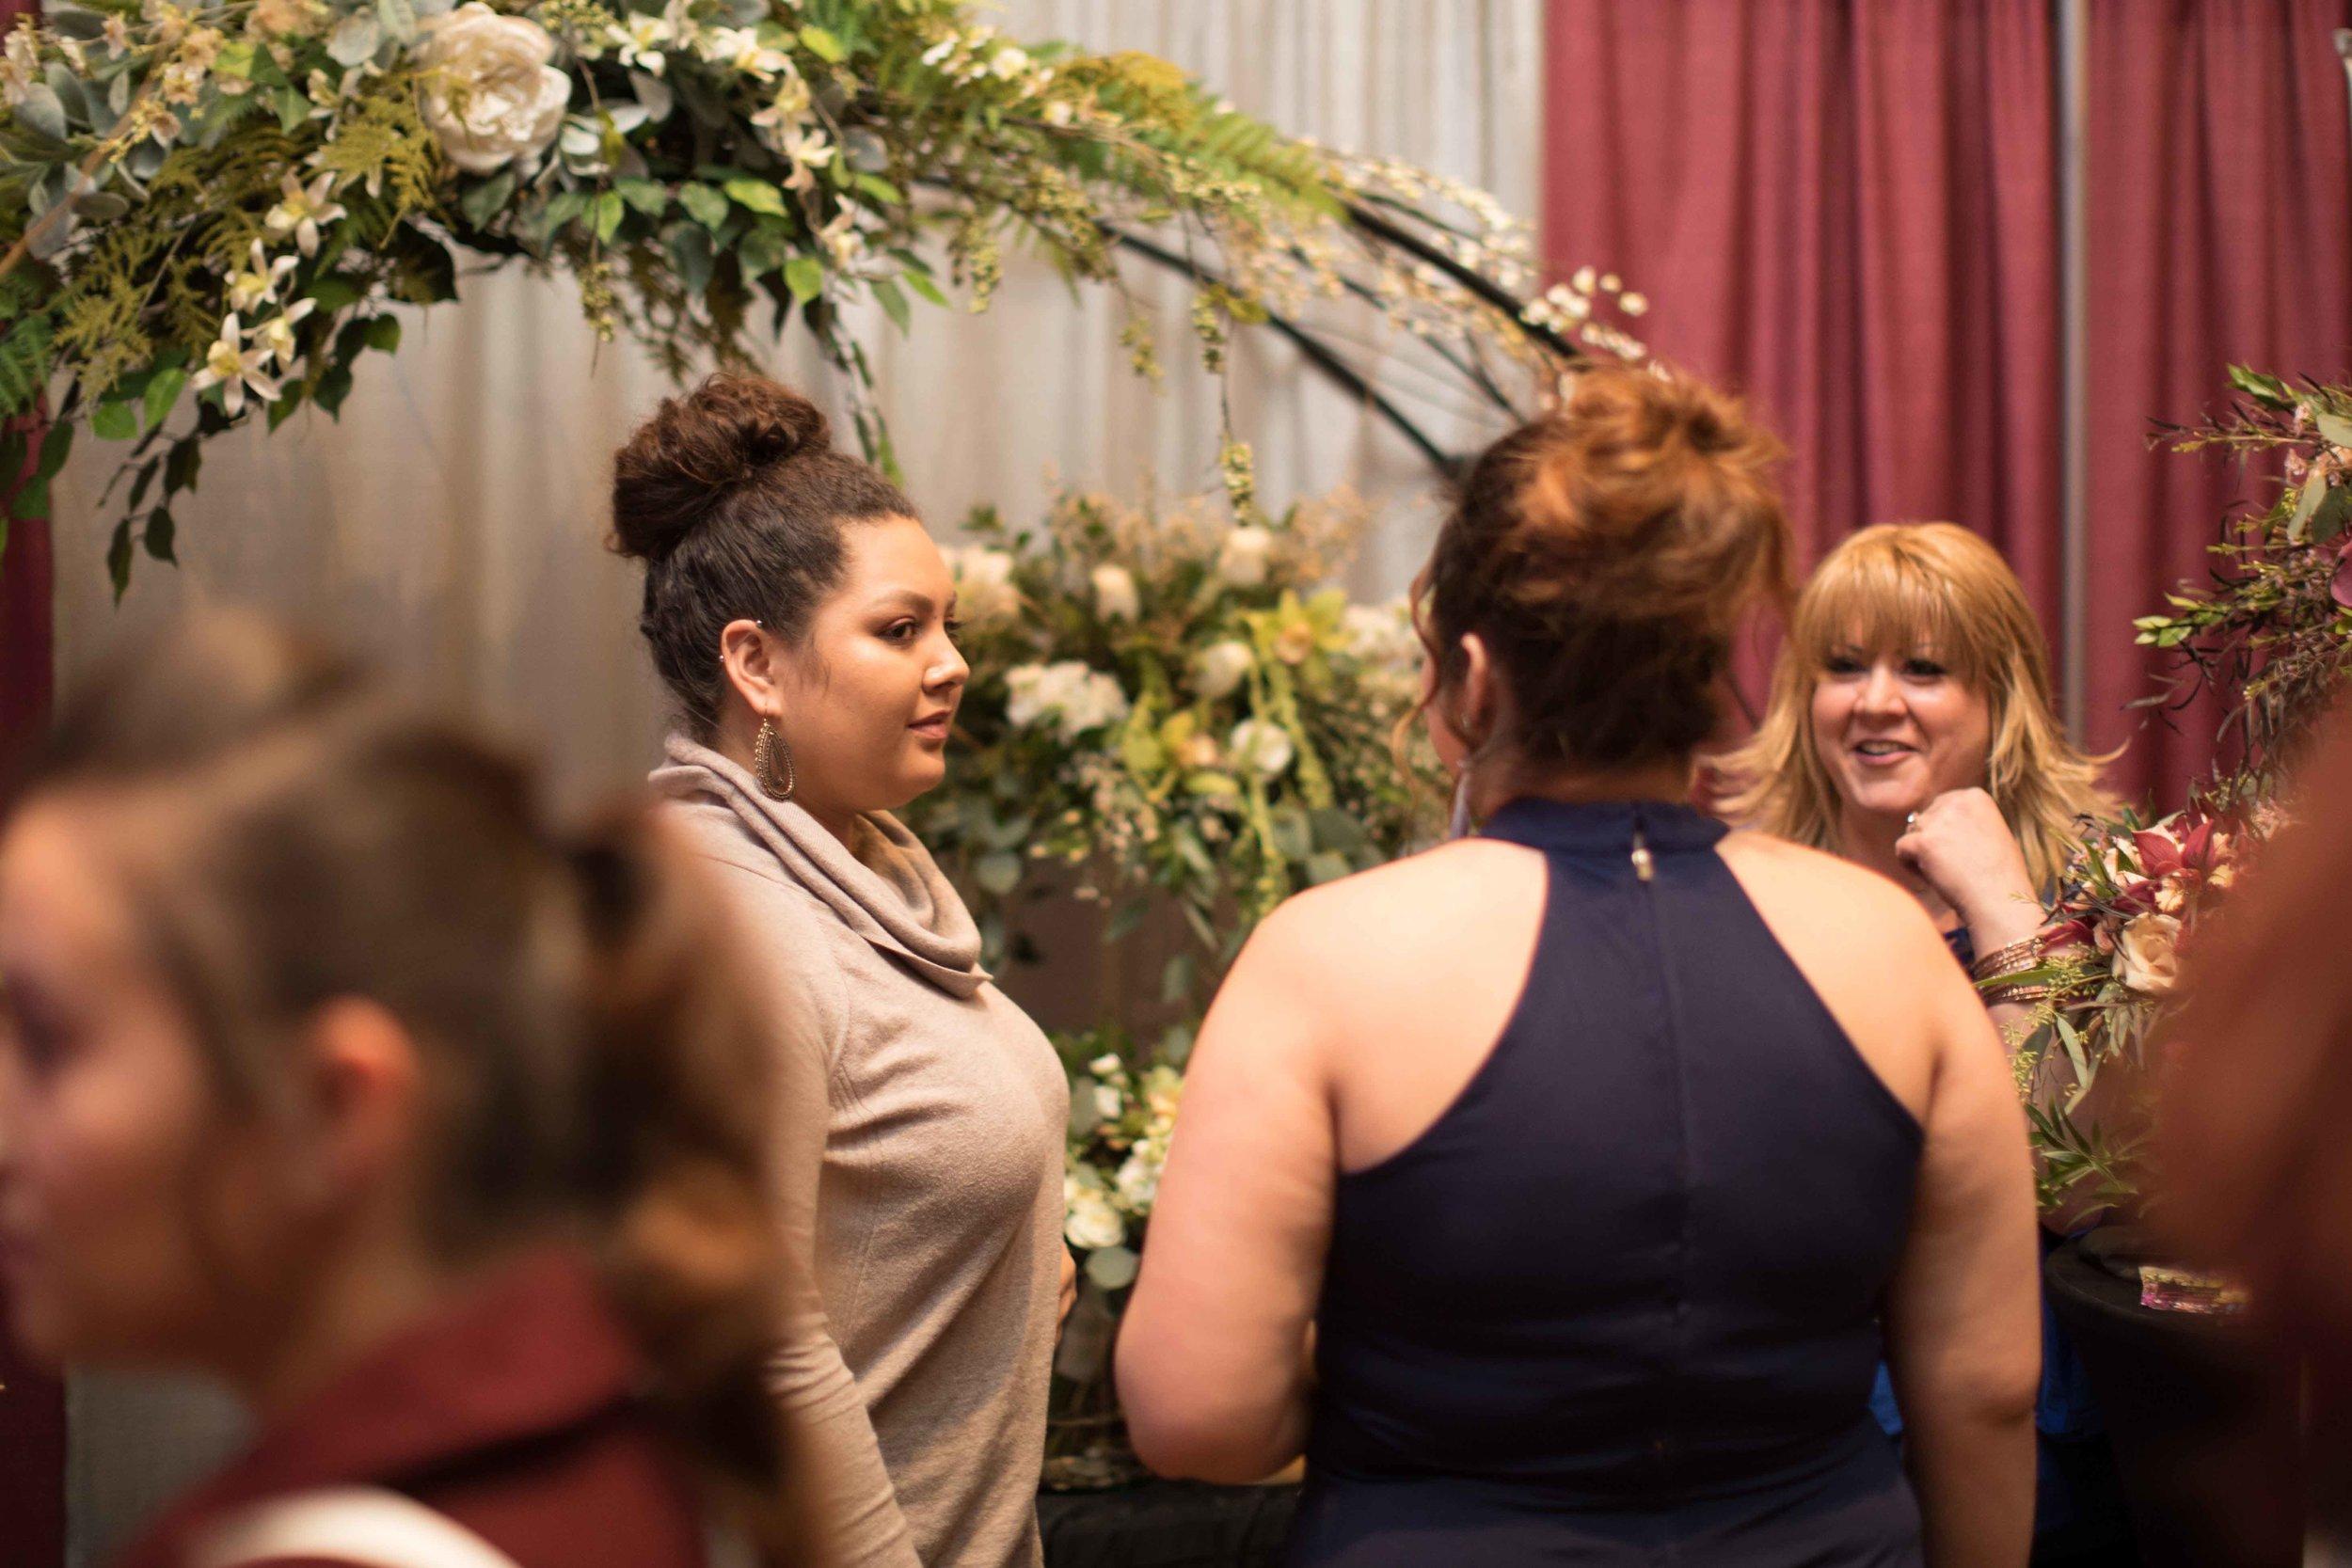 NM Wed Expo - Shannon Loves Flowers 2.jpg